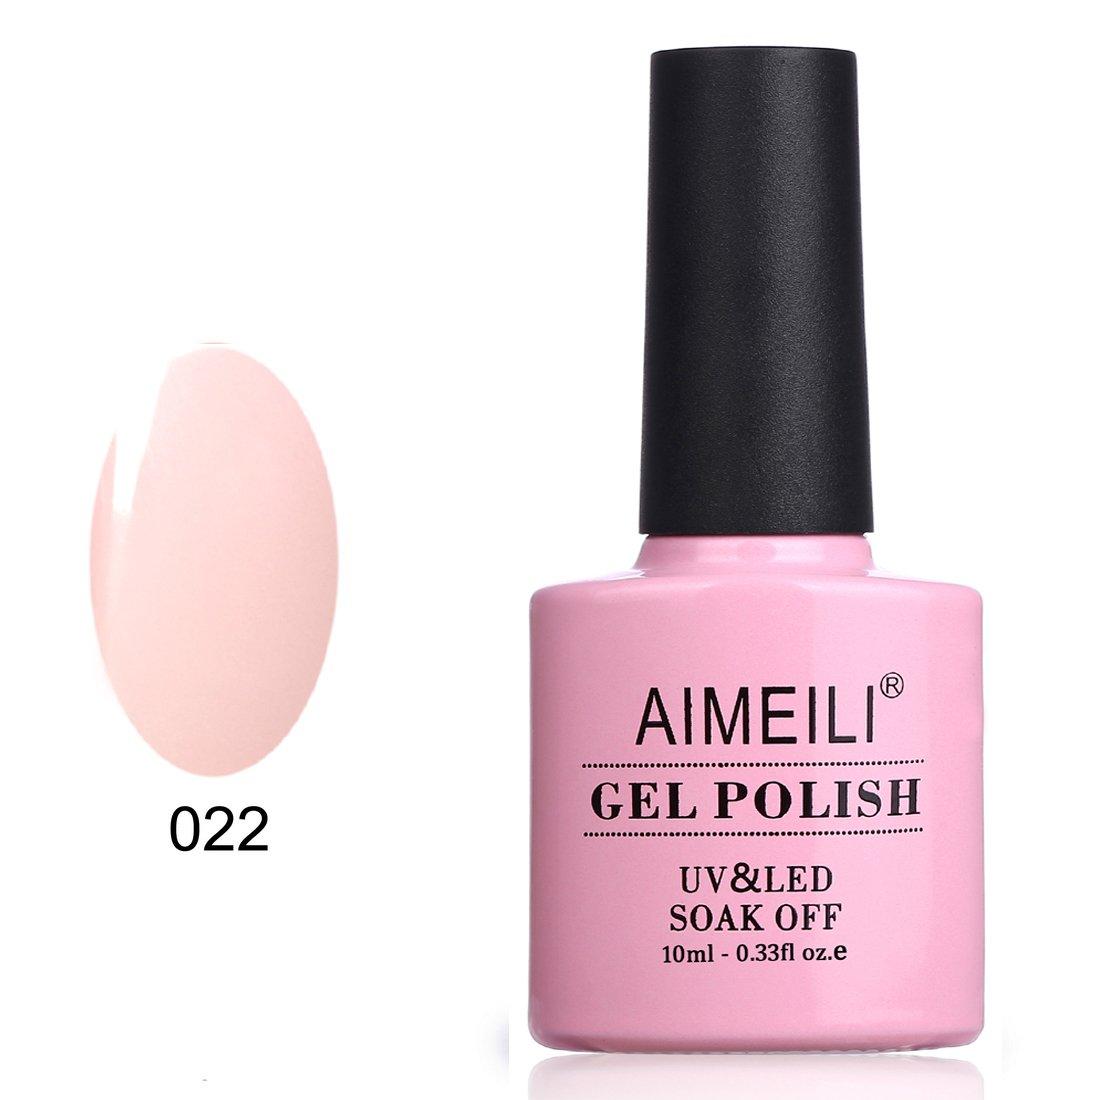 AIMEILI Soak Off UV LED Gel Nail Polish - Rose Nude (022) 10ml